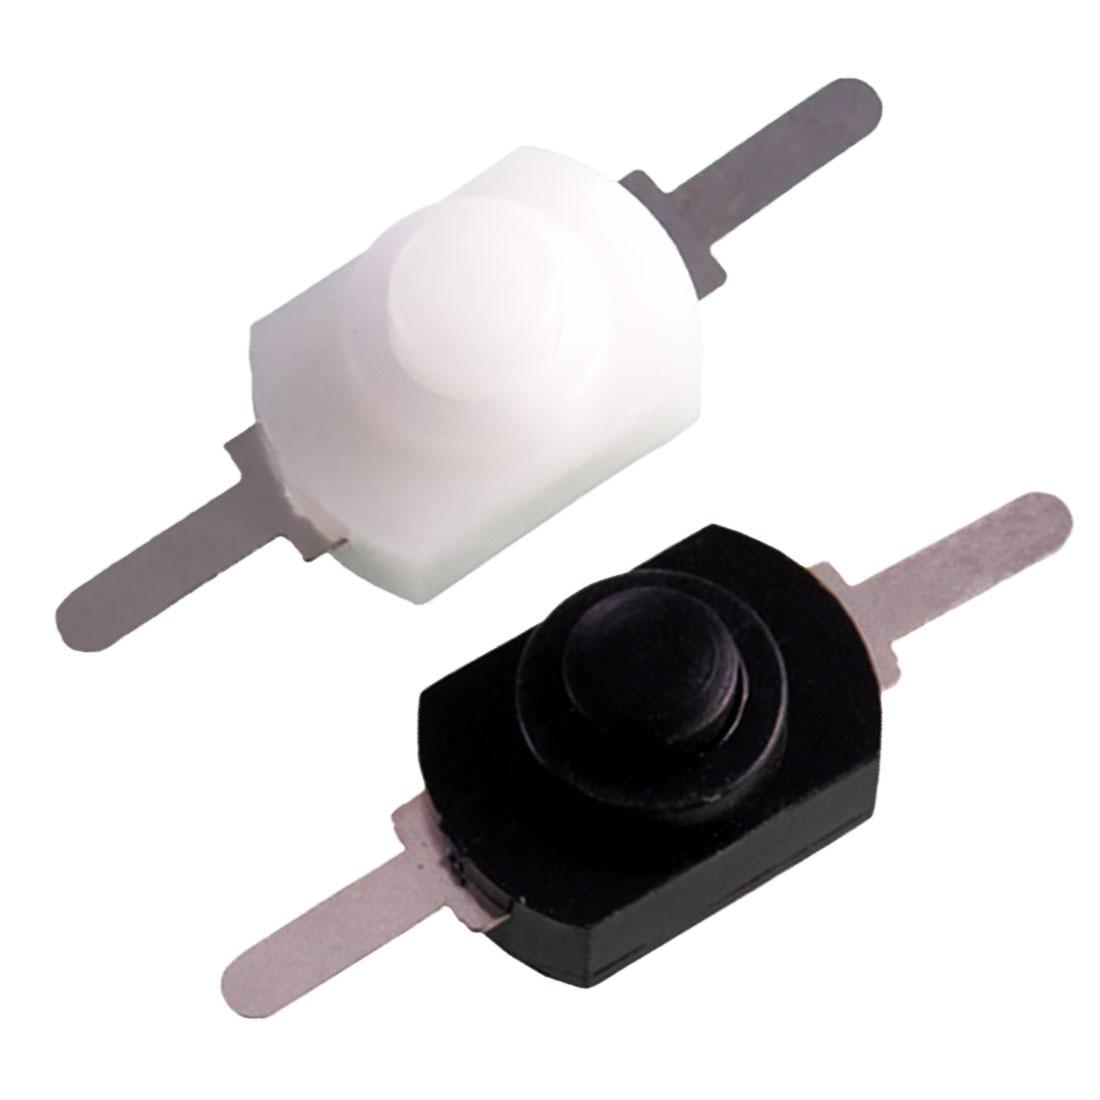 10x 1A 30V DC 250V Black Latching On Off Mini Torch Push Button Switch ONZY